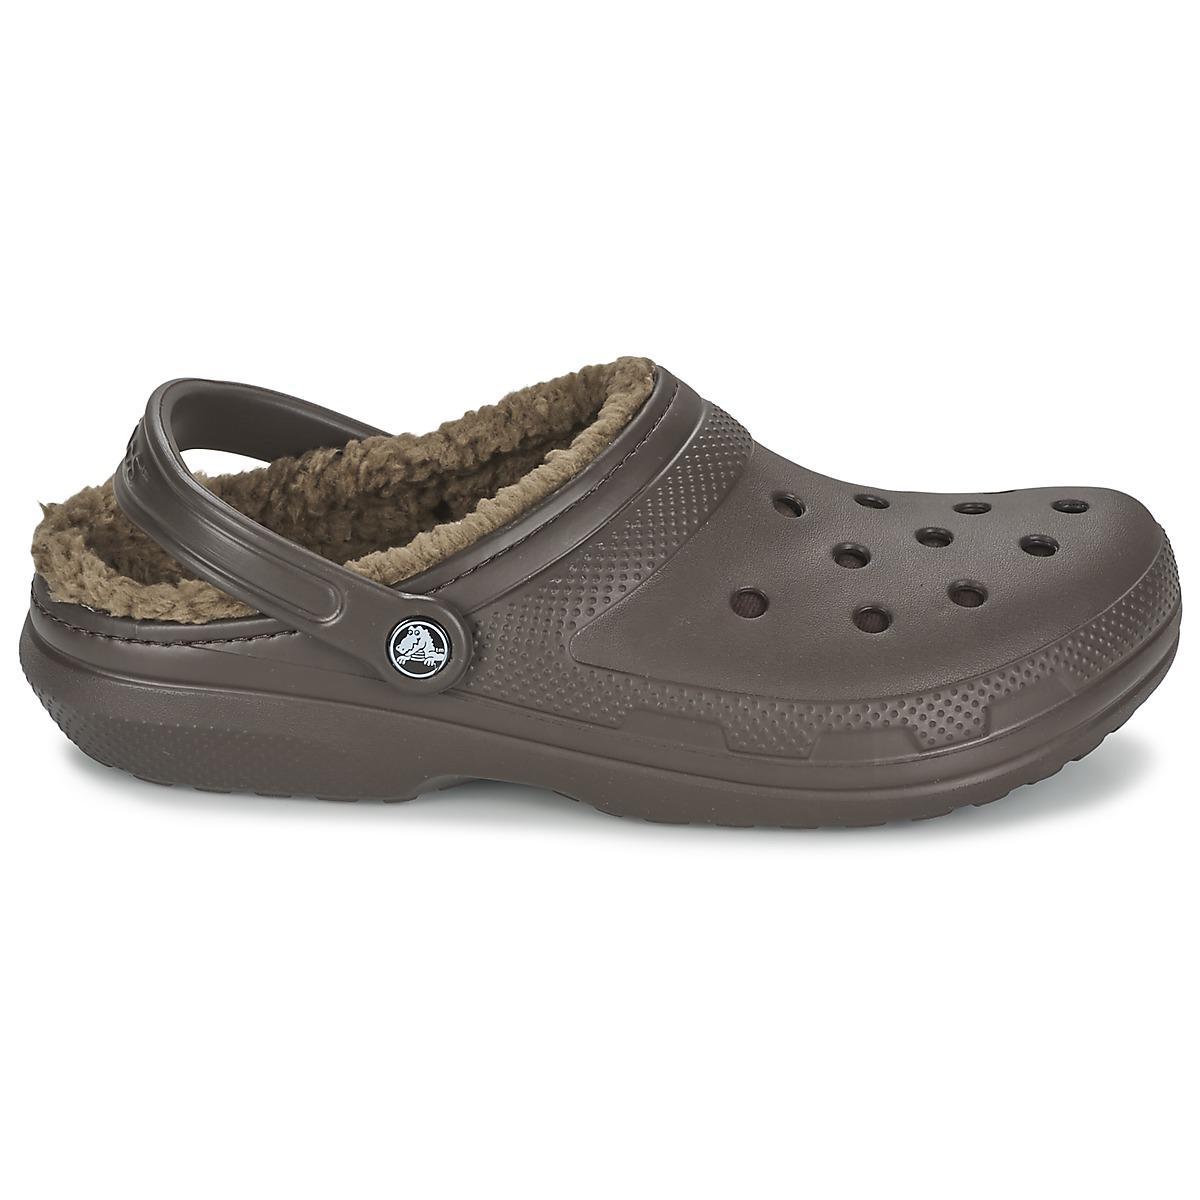 483c3c1b96c Crocs™ - Brown Classic Lined Clog Clogs (shoes) - Lyst. View fullscreen